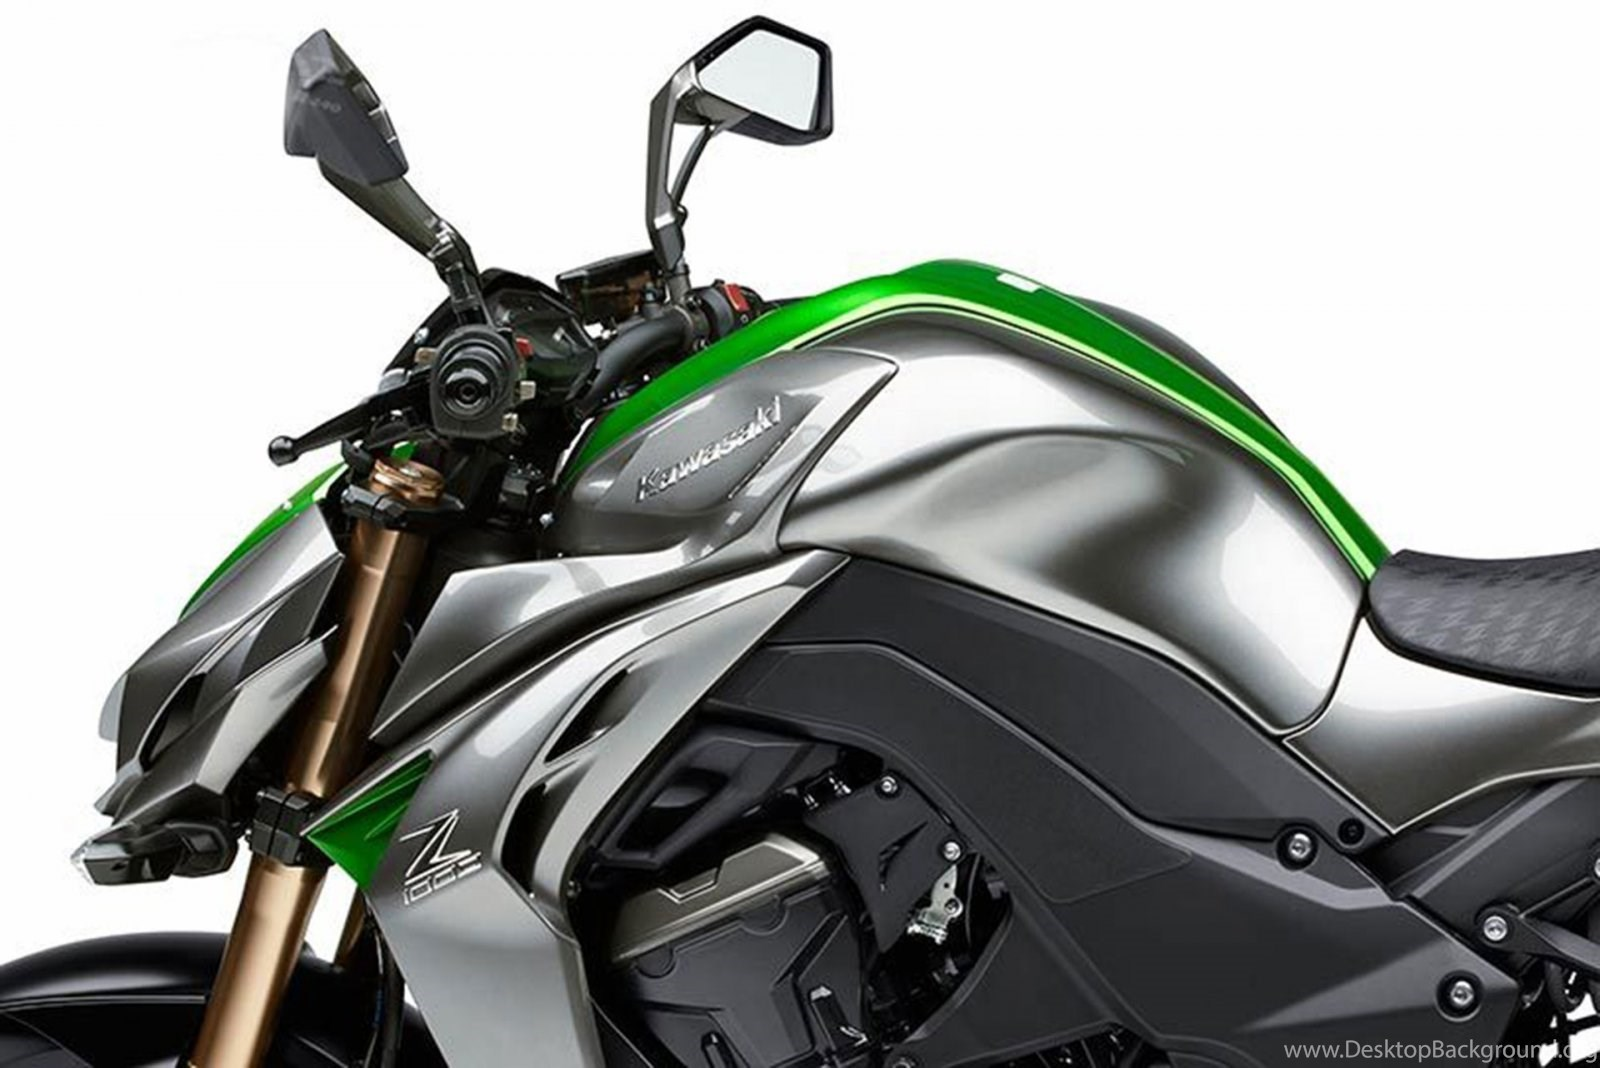 Free Download Kawasaki Z1000 HD Images Wallpapers BikePortalin